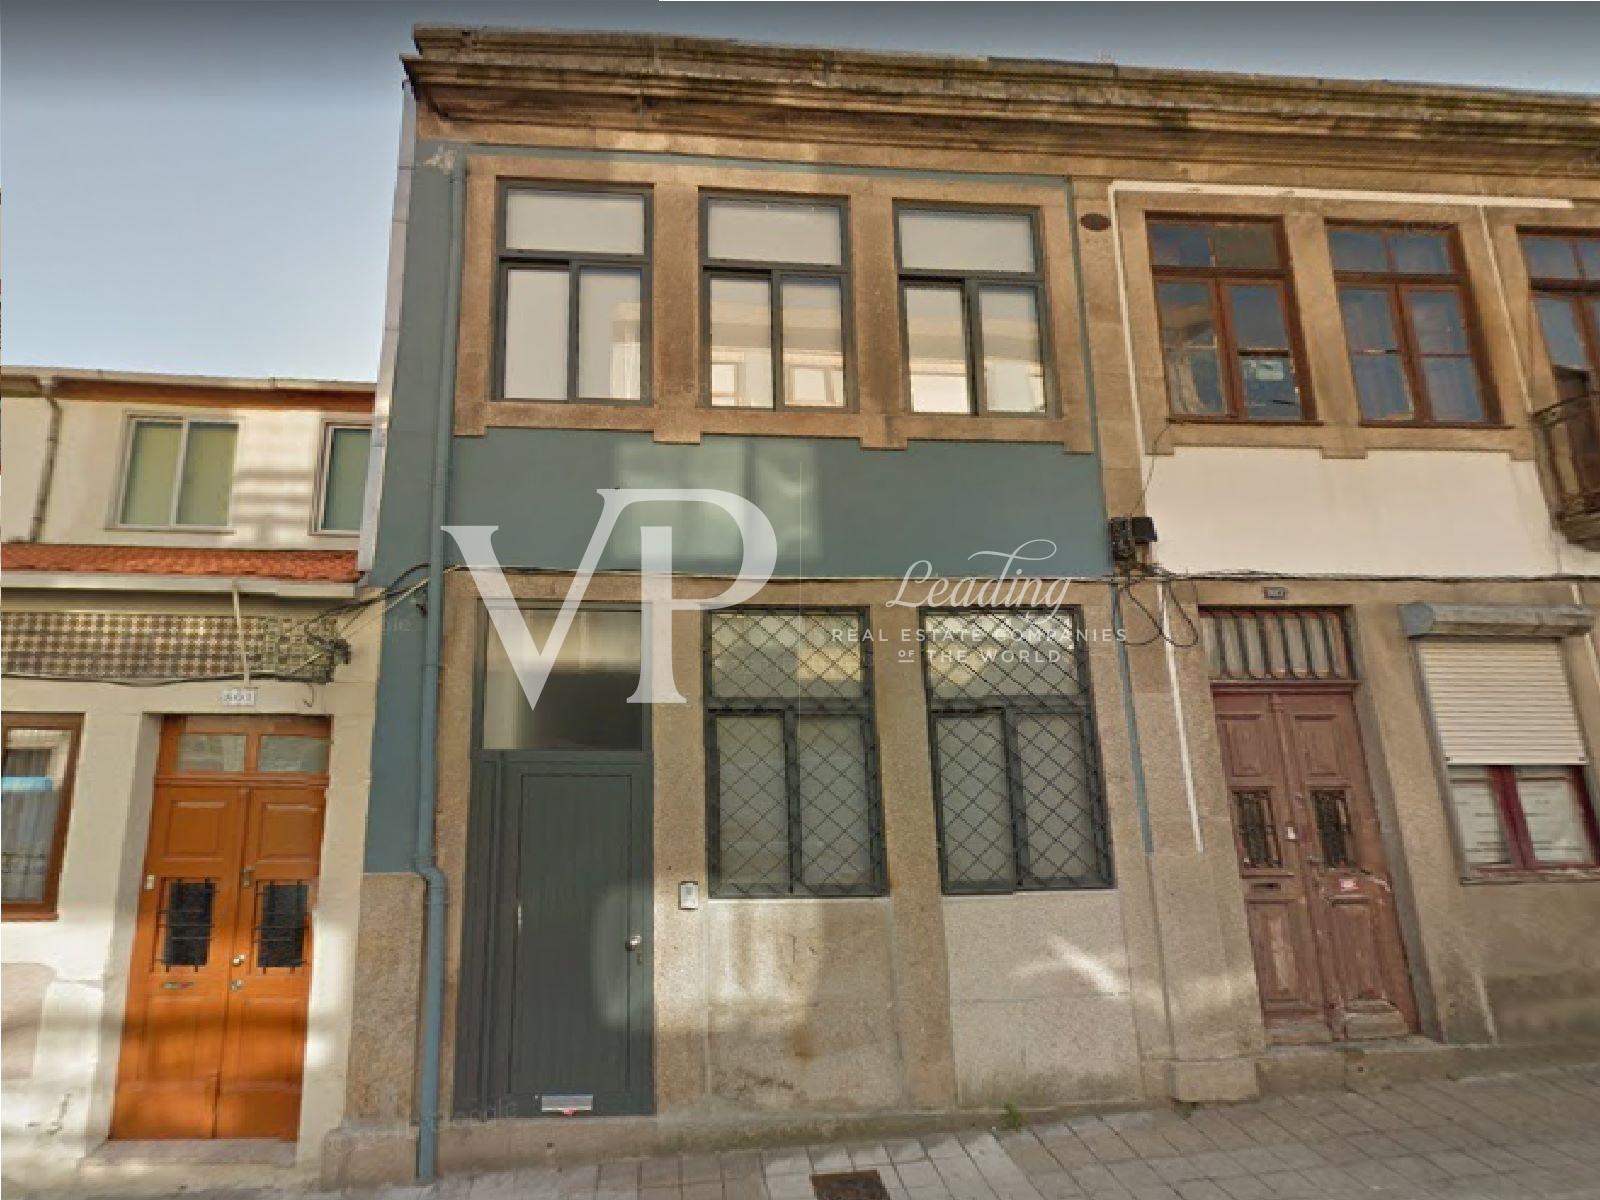 Moradia T2, Porto, Venda, VP,Imobiliaria, Porto, Porto